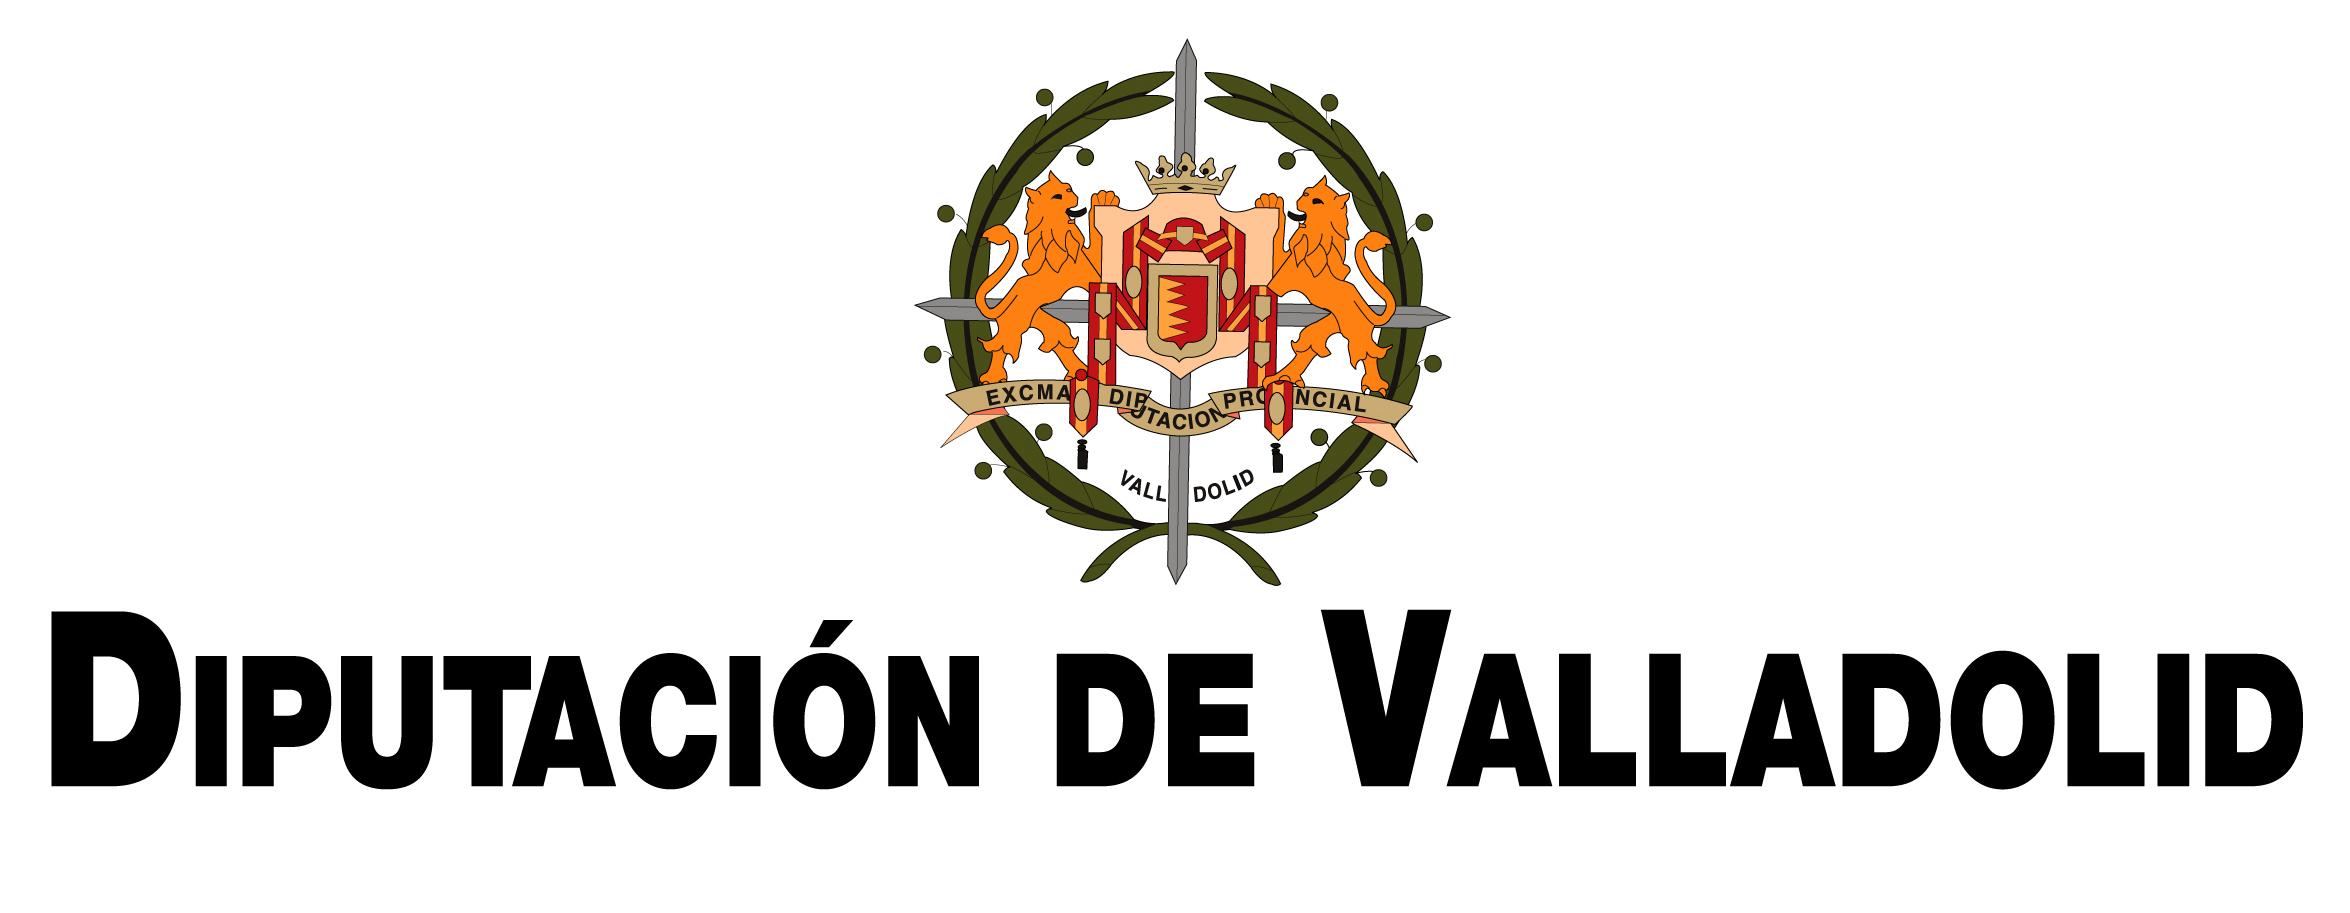 Diputacion Valladolid